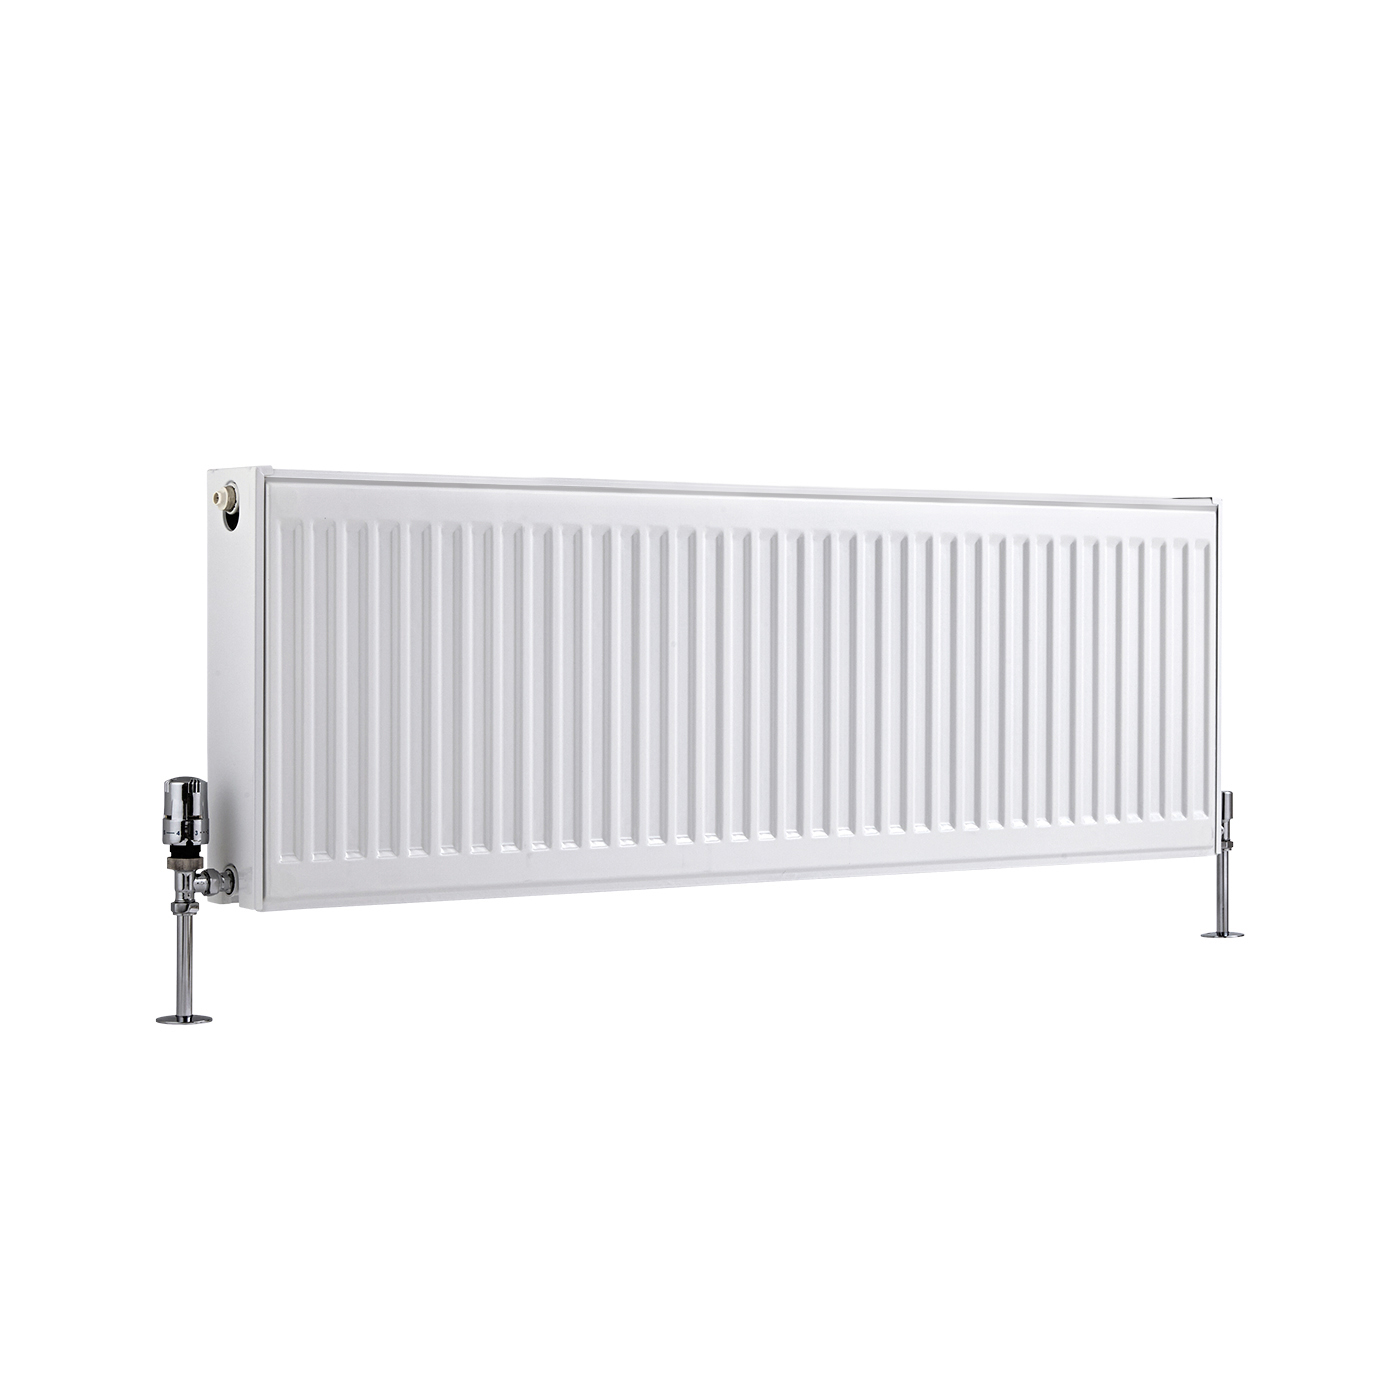 Basic Paneelradiator T 22 Horizontaal Wit 40cm x 120cm x 10,3cm 1387 Watt